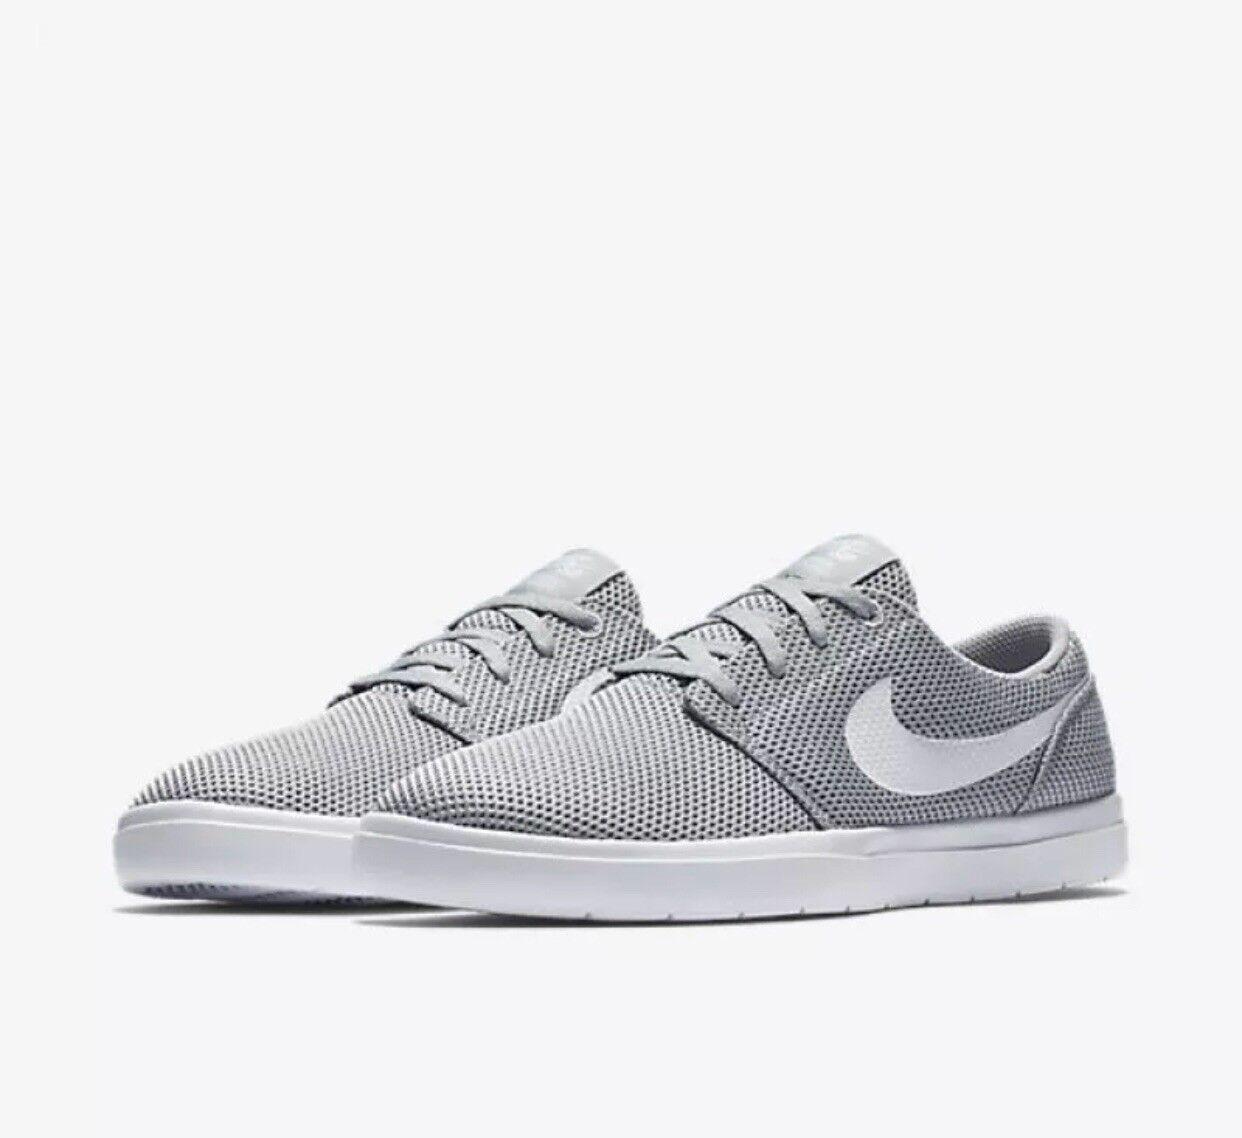 Nike sb portmore ii 880271-011 ultralight mens 880271-011 ii wolf grauen skate - schuhe größe 7,5 1fa917